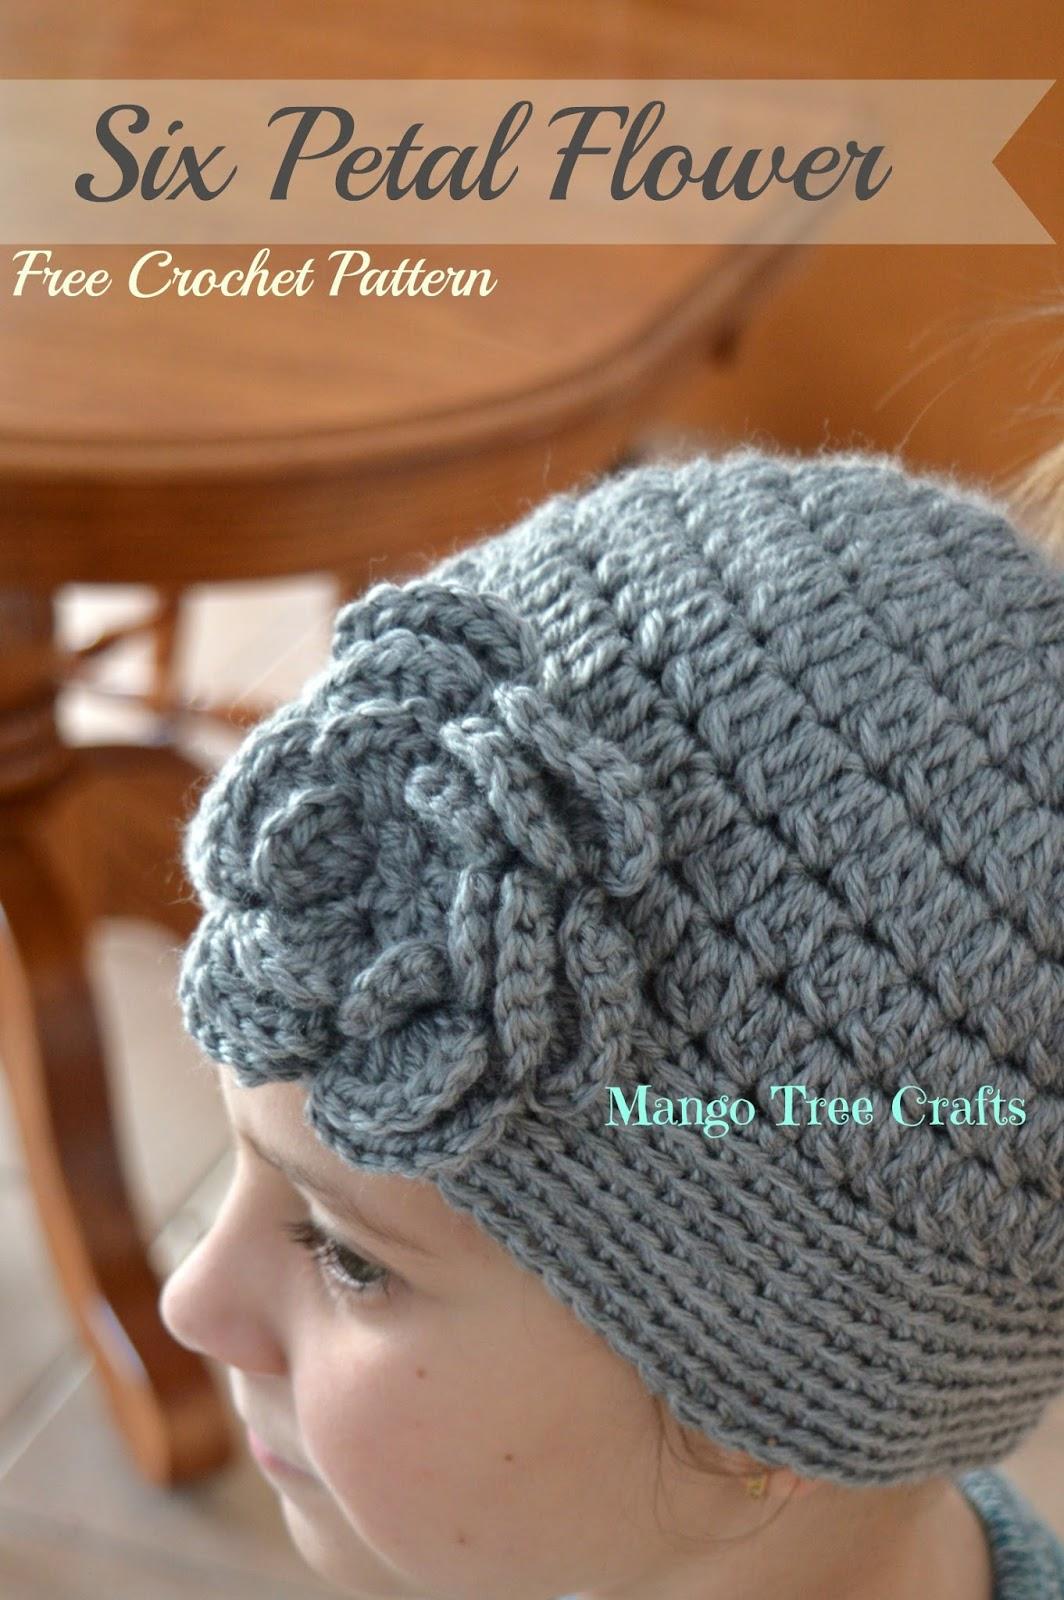 Six Petal Flower Free Crochet Pattern and Photo Tutorial